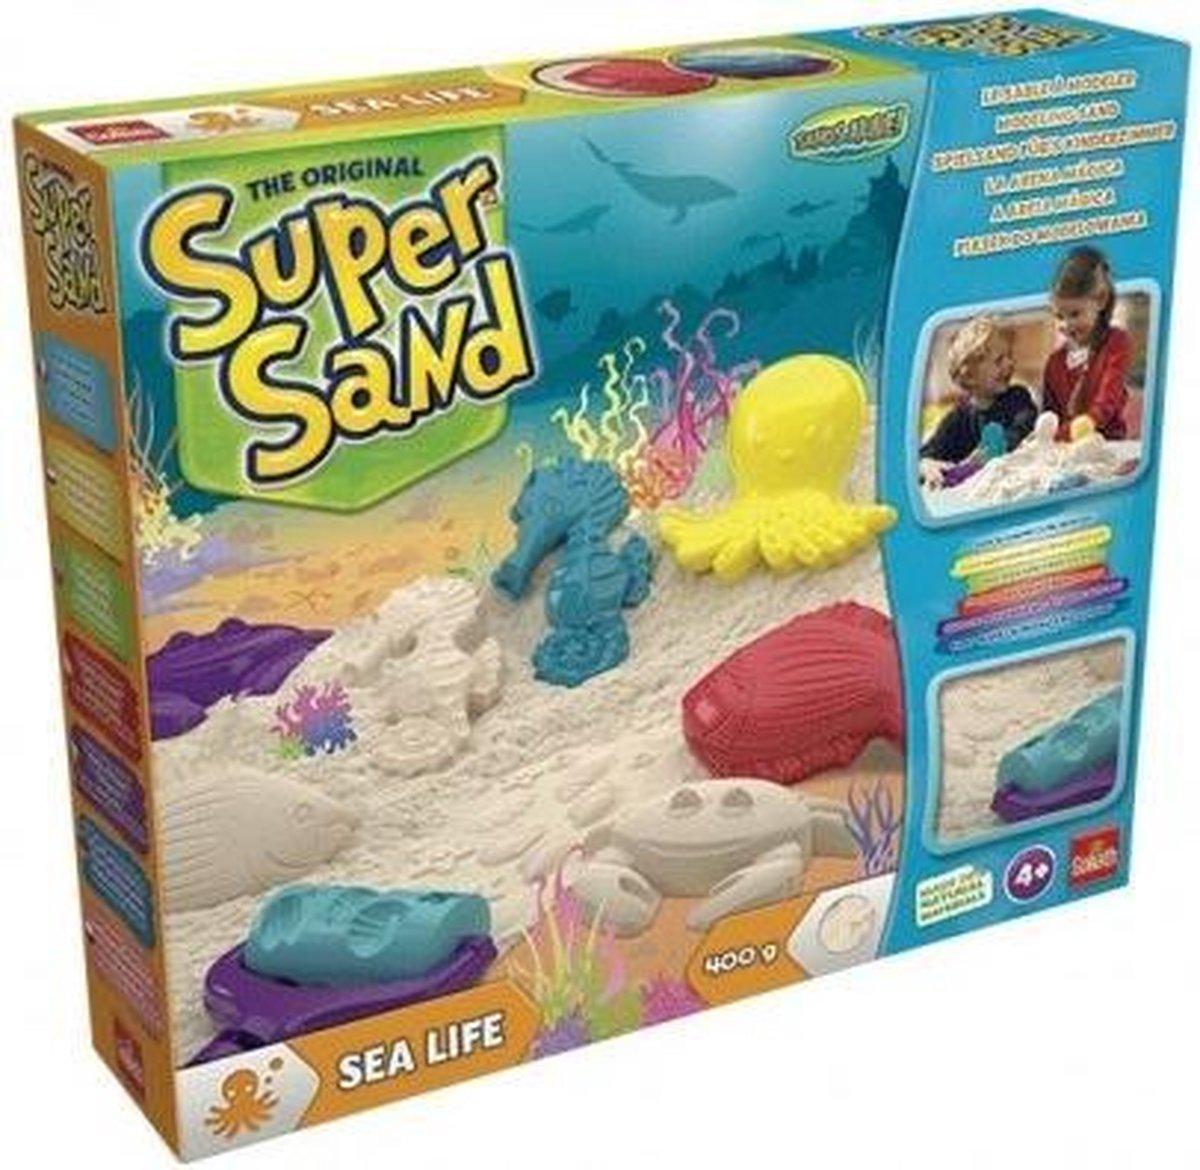 Super Sand Sealife speelzand 7-delig